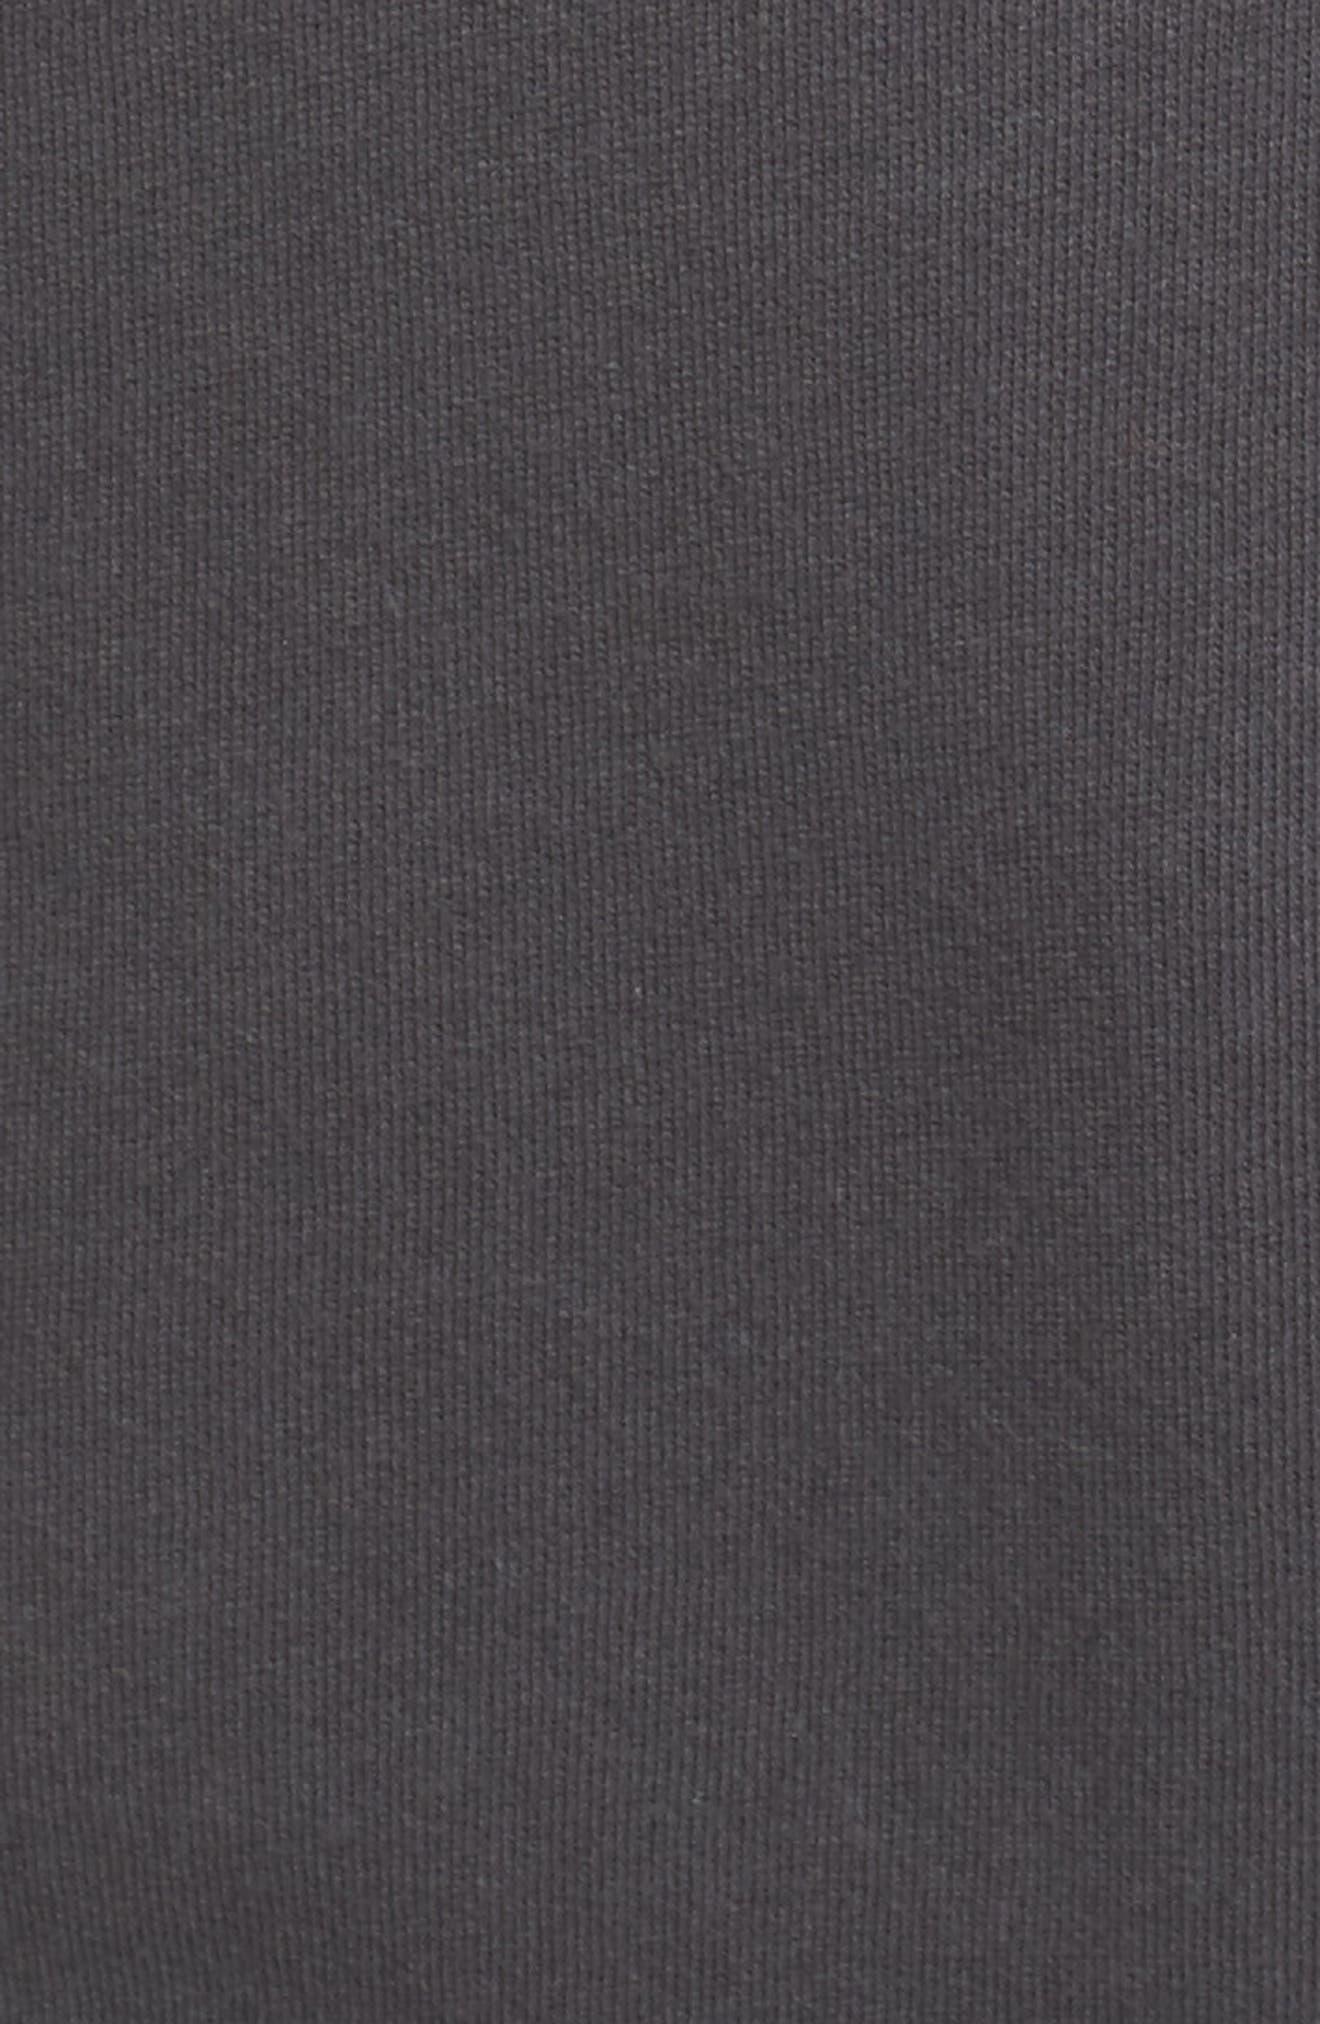 Feeling Bubbly Sweatshirt,                             Alternate thumbnail 5, color,                             Black